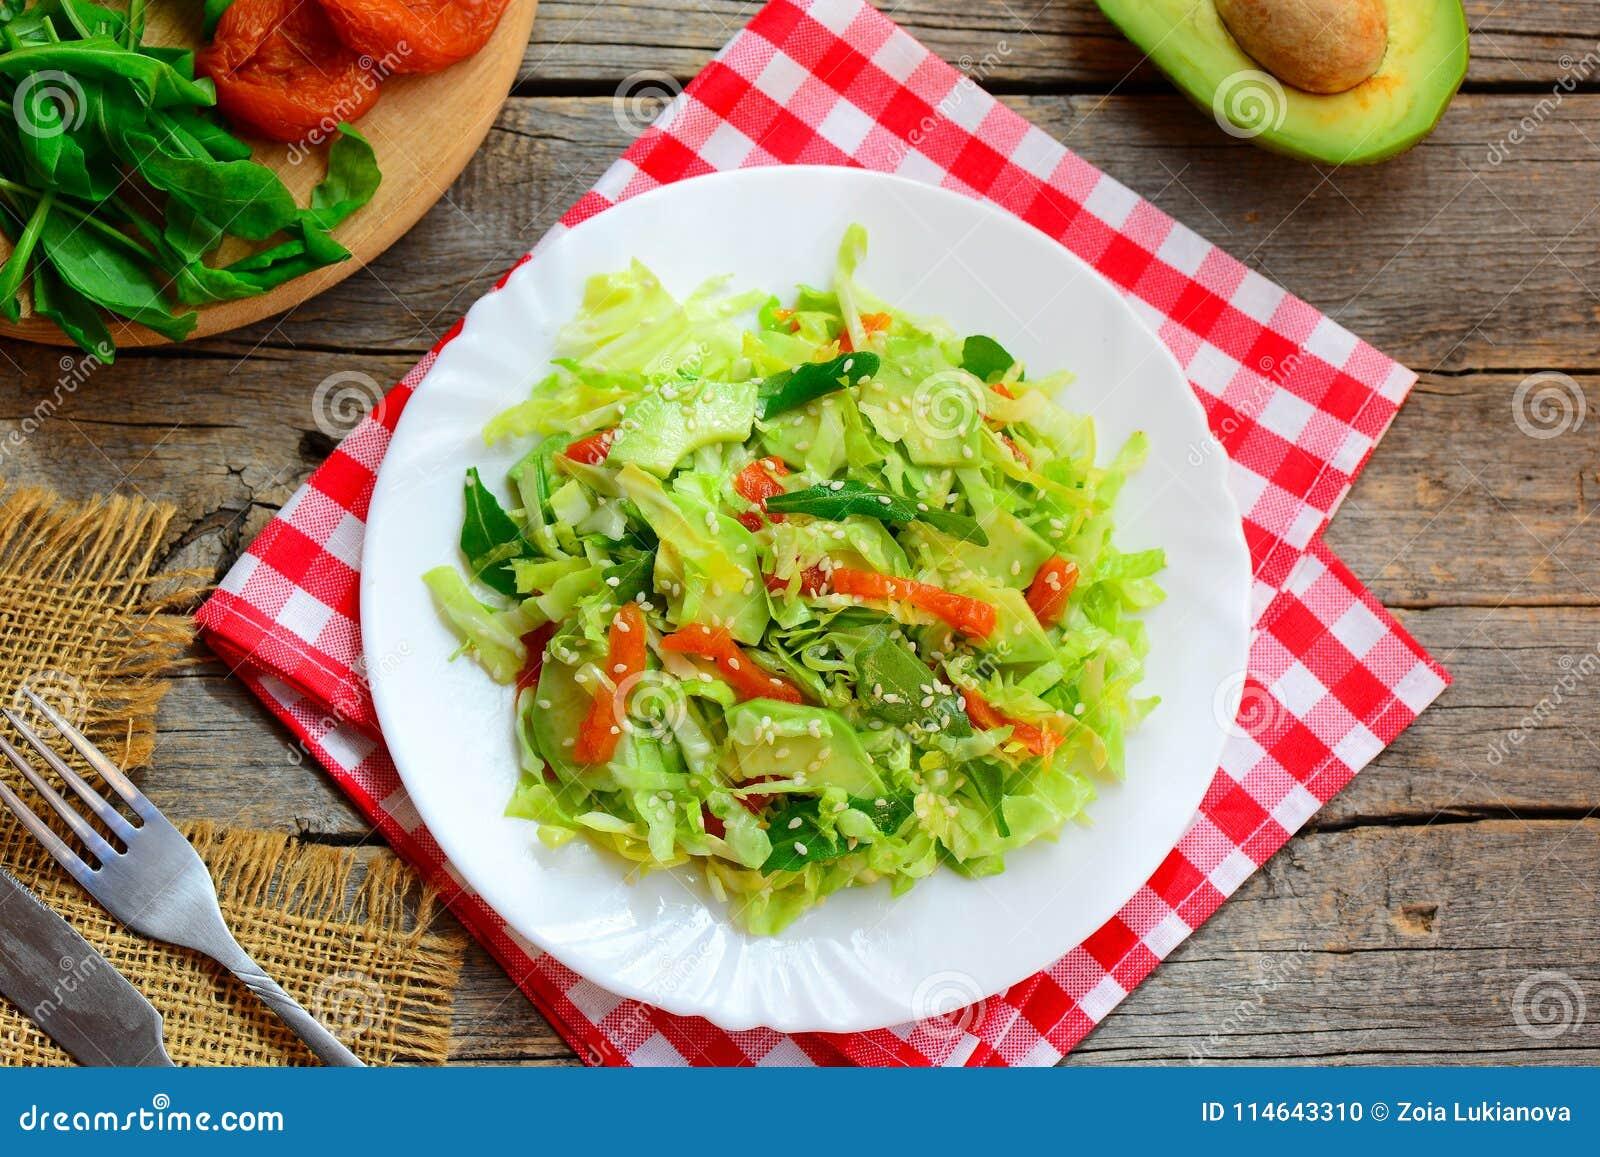 dieta vegetariana ricette ricette perdita di peso